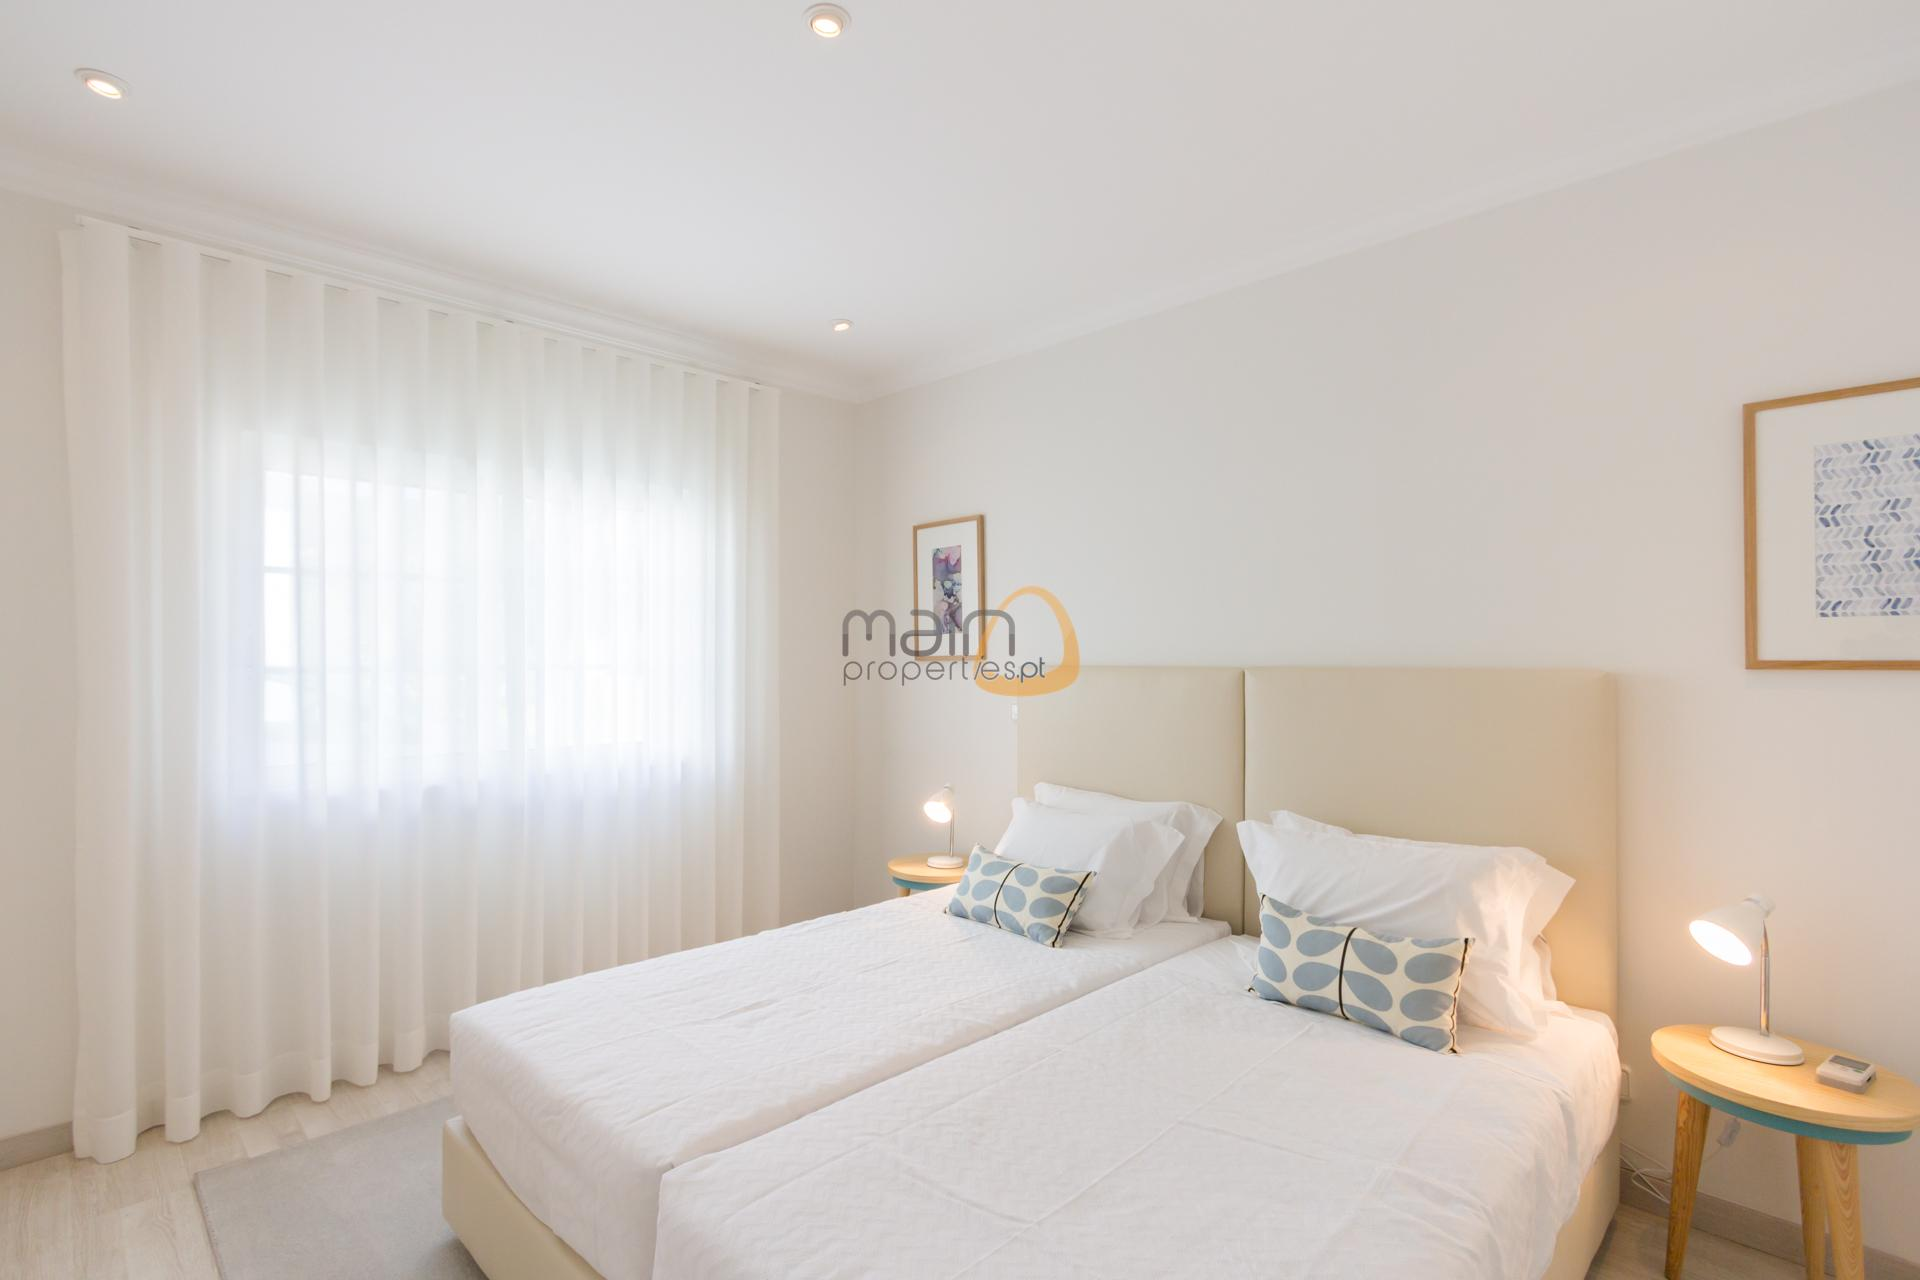 apartment-in-vale-do-lobo-algarve-golden-triangle-portugal-property-real-estate-mainproperties-mp134vdl-5